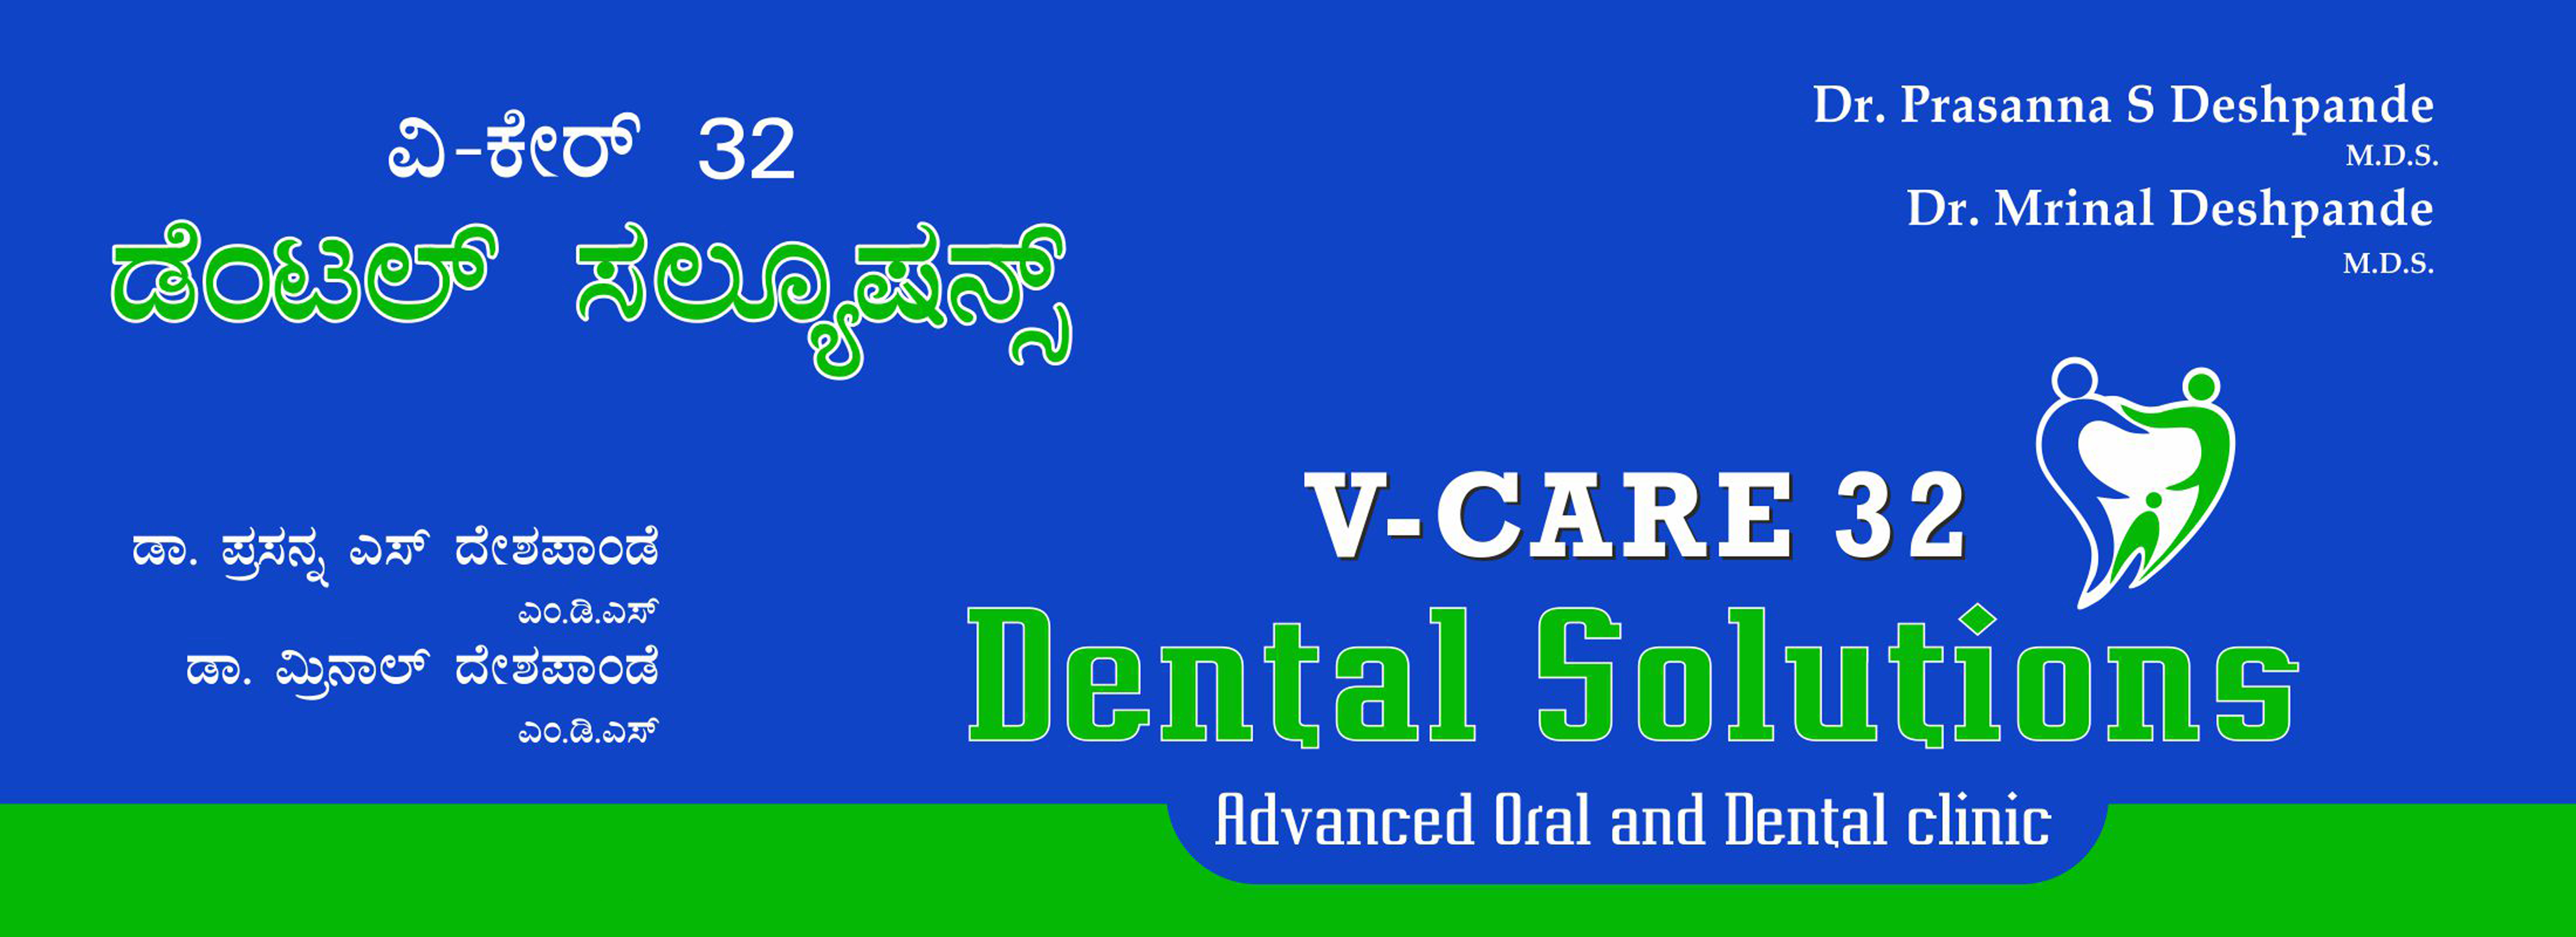 V-Care 32 Dental Solutions